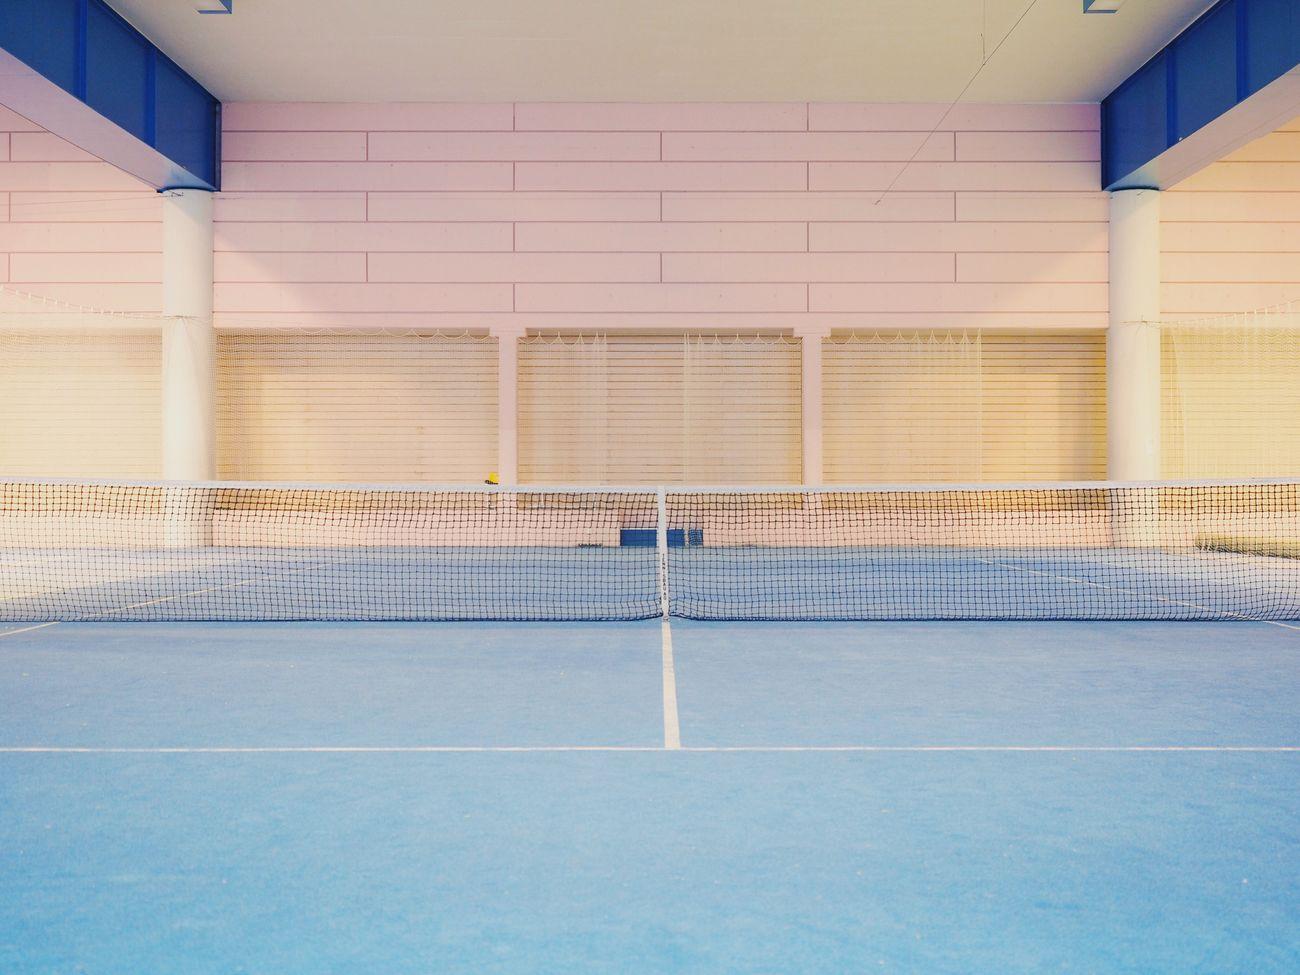 Sport Tennis Court Indoors  Architecture Tennis Net Symmetry Minimalism Minimalobsession Minimalist Architecture Pastel Colors Pastel Built Structure Art Leukerbad Switzerland Millennial Pink